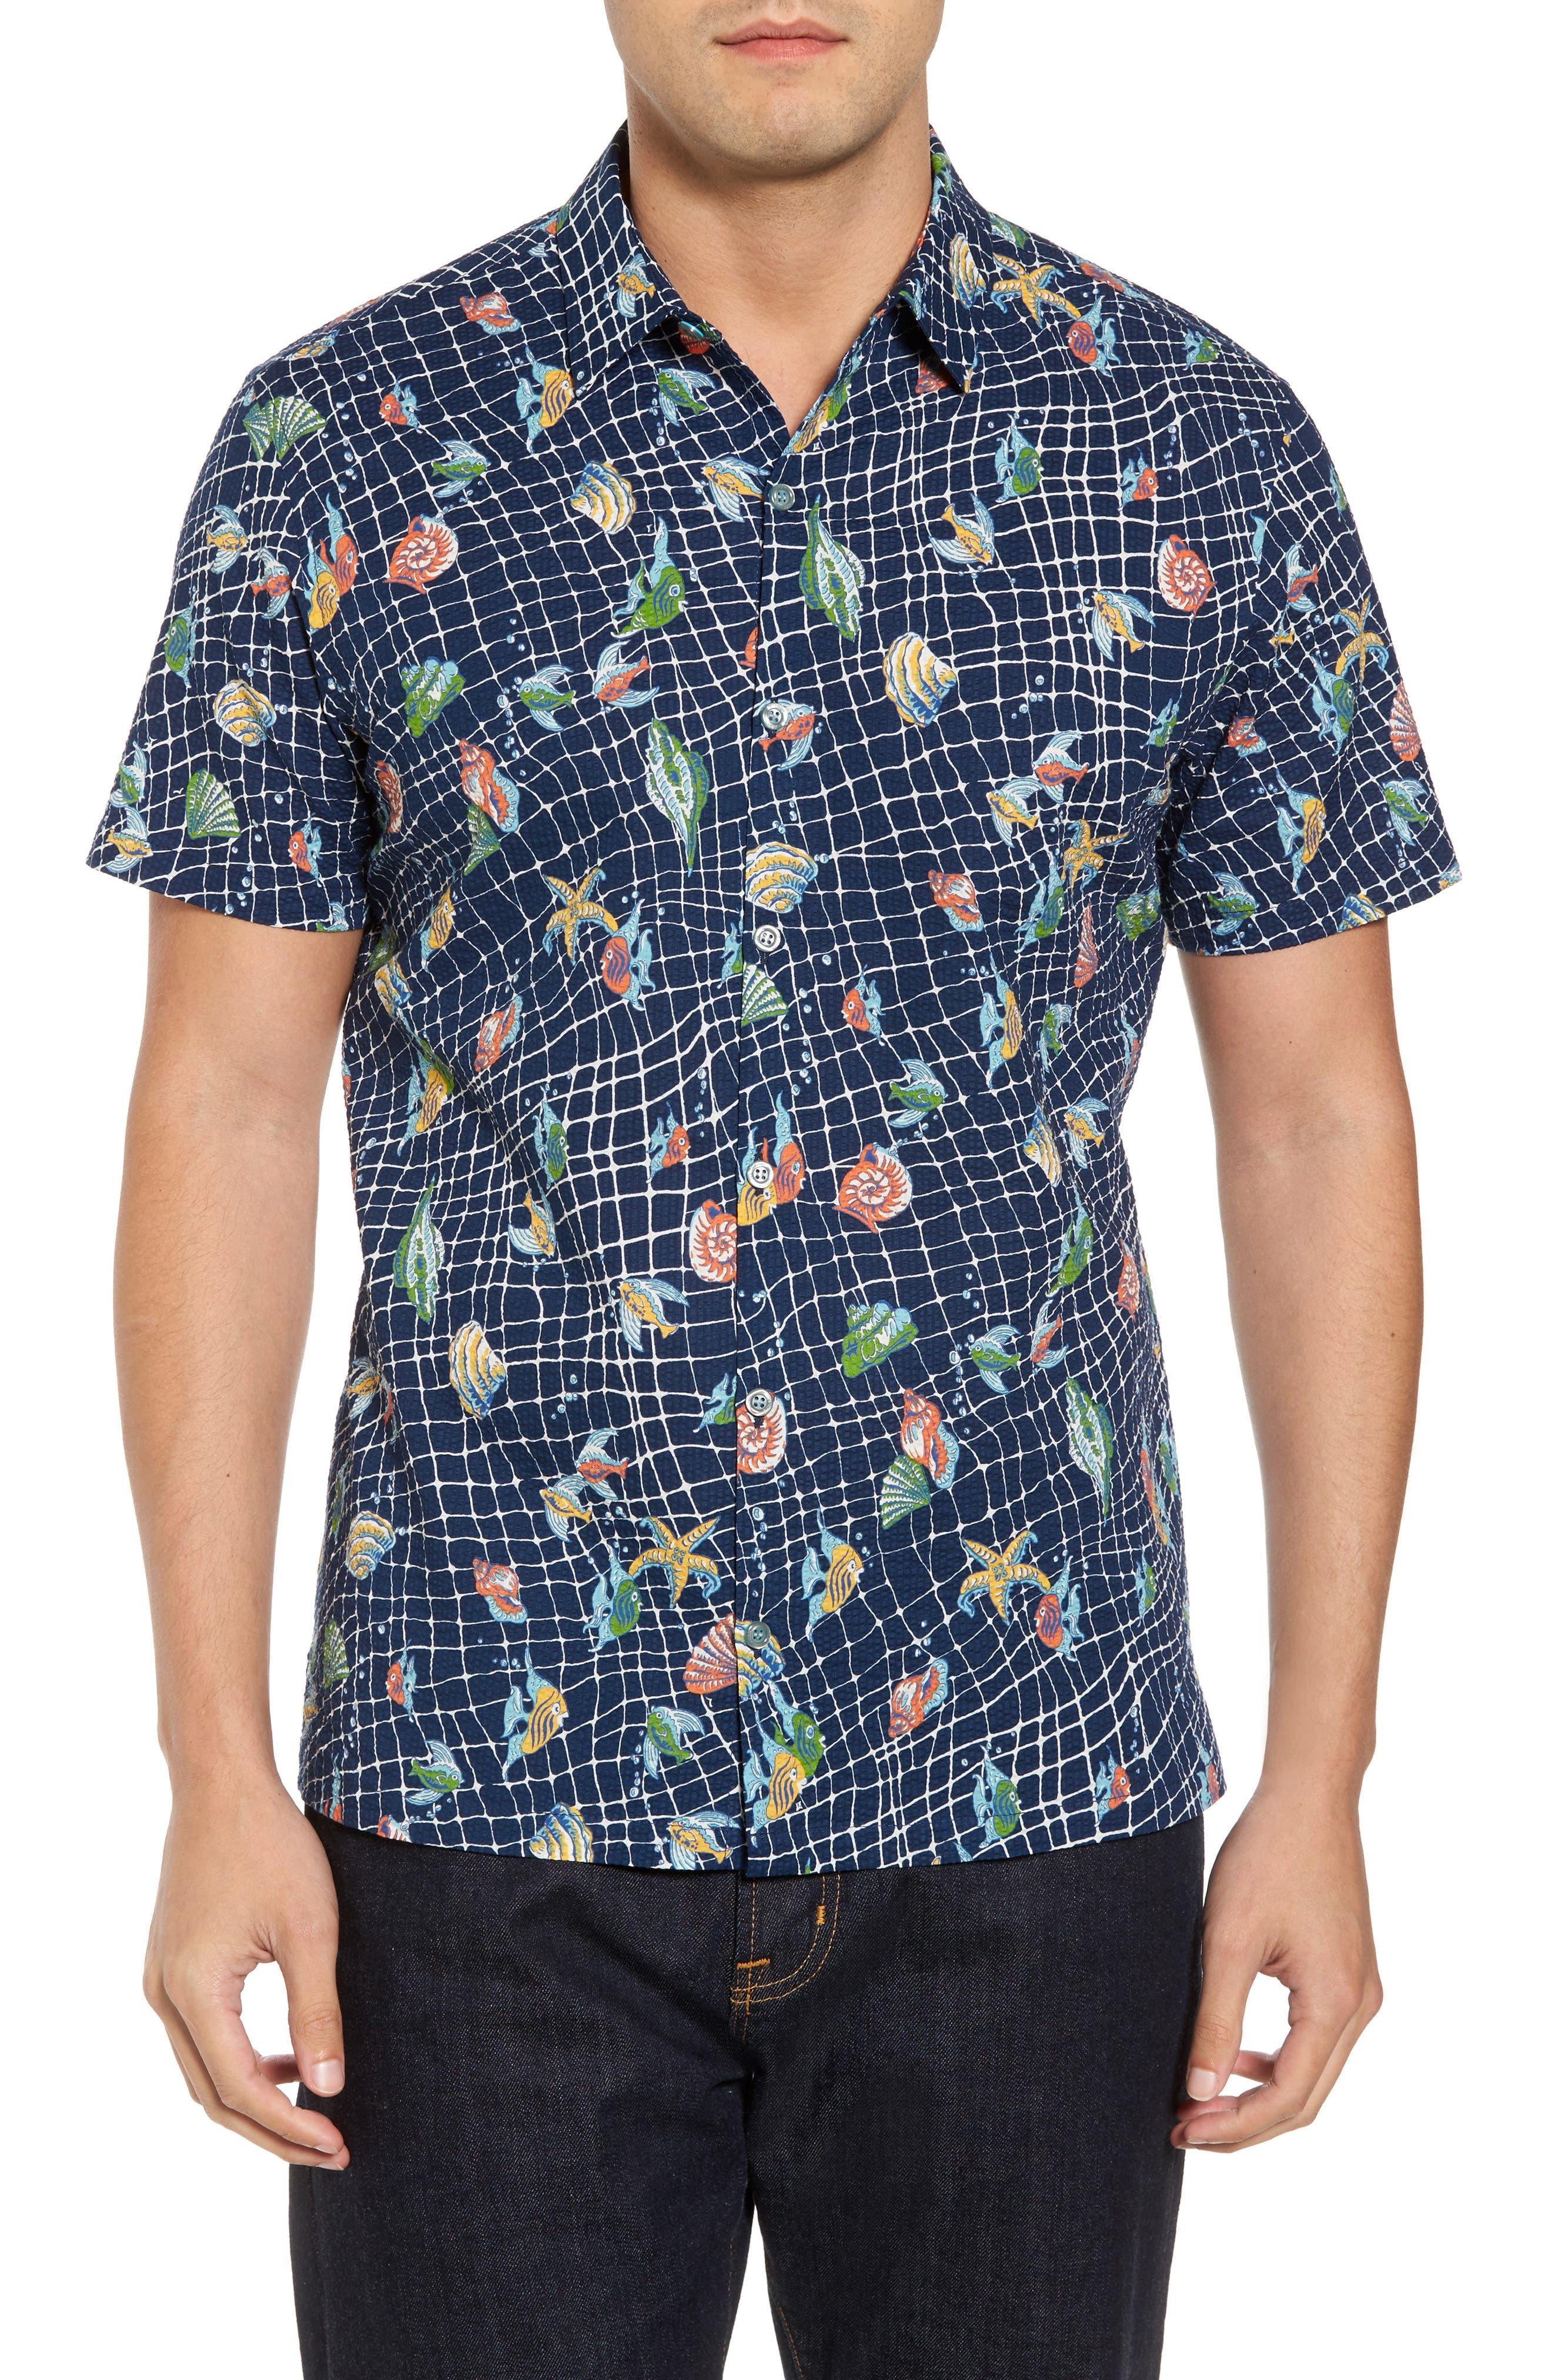 Alternate Image 1 Selected - Tori Richard Catch All Print Sport Shirt